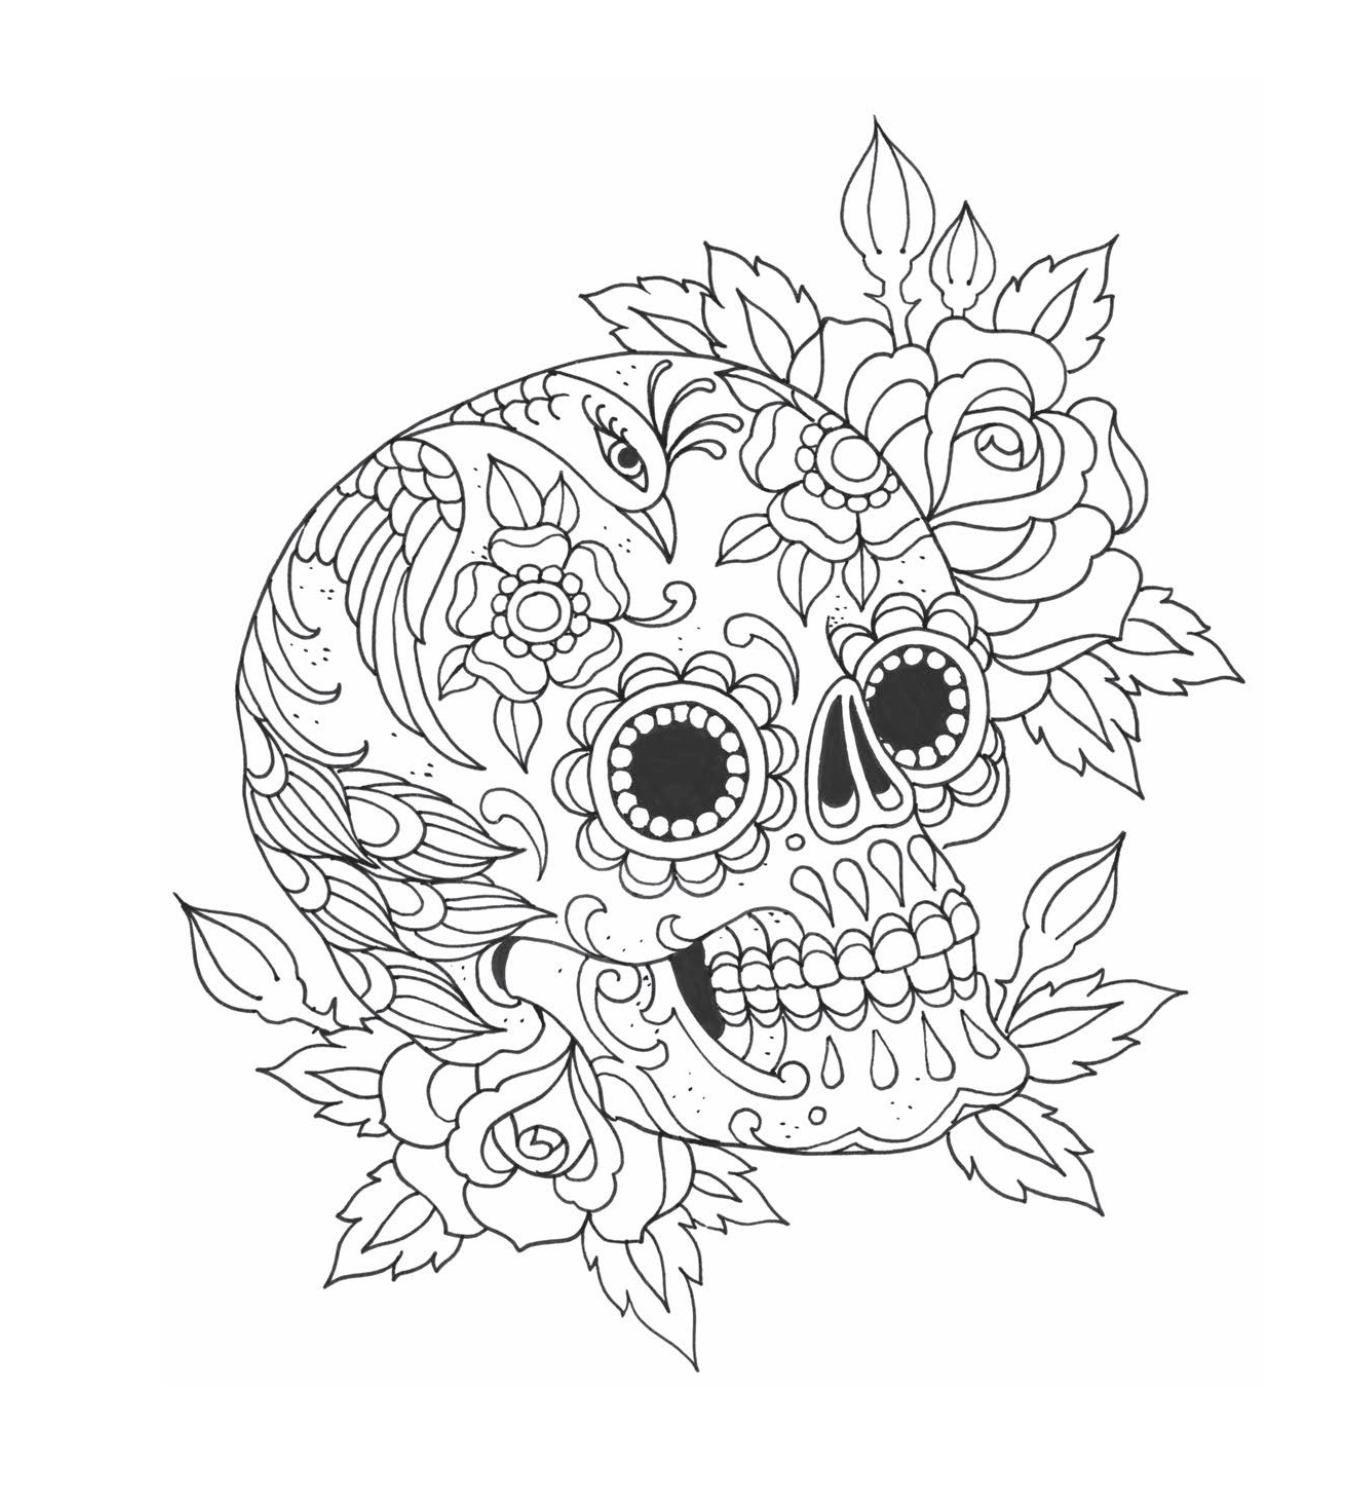 Classic Tattoo Designs Coloring Book Dover Design Coloring Books Eric Gottesman 978048 Traditional Tattoo Drawings Classic Tattoo Old School Tattoo Designs